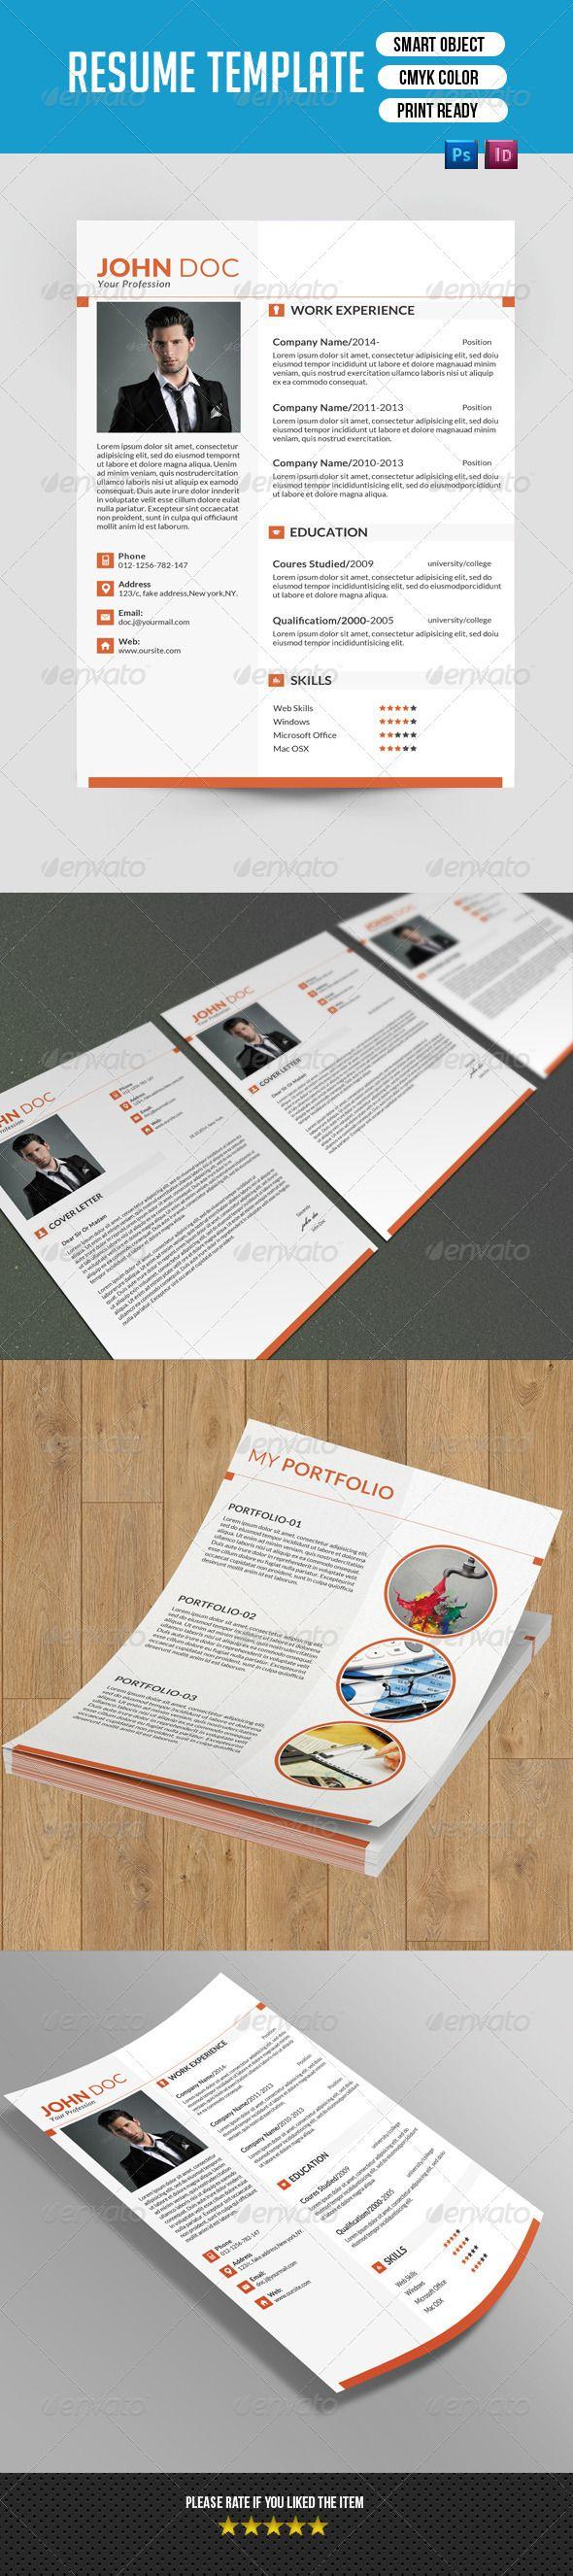 guerrilla resume template resume hobbies and